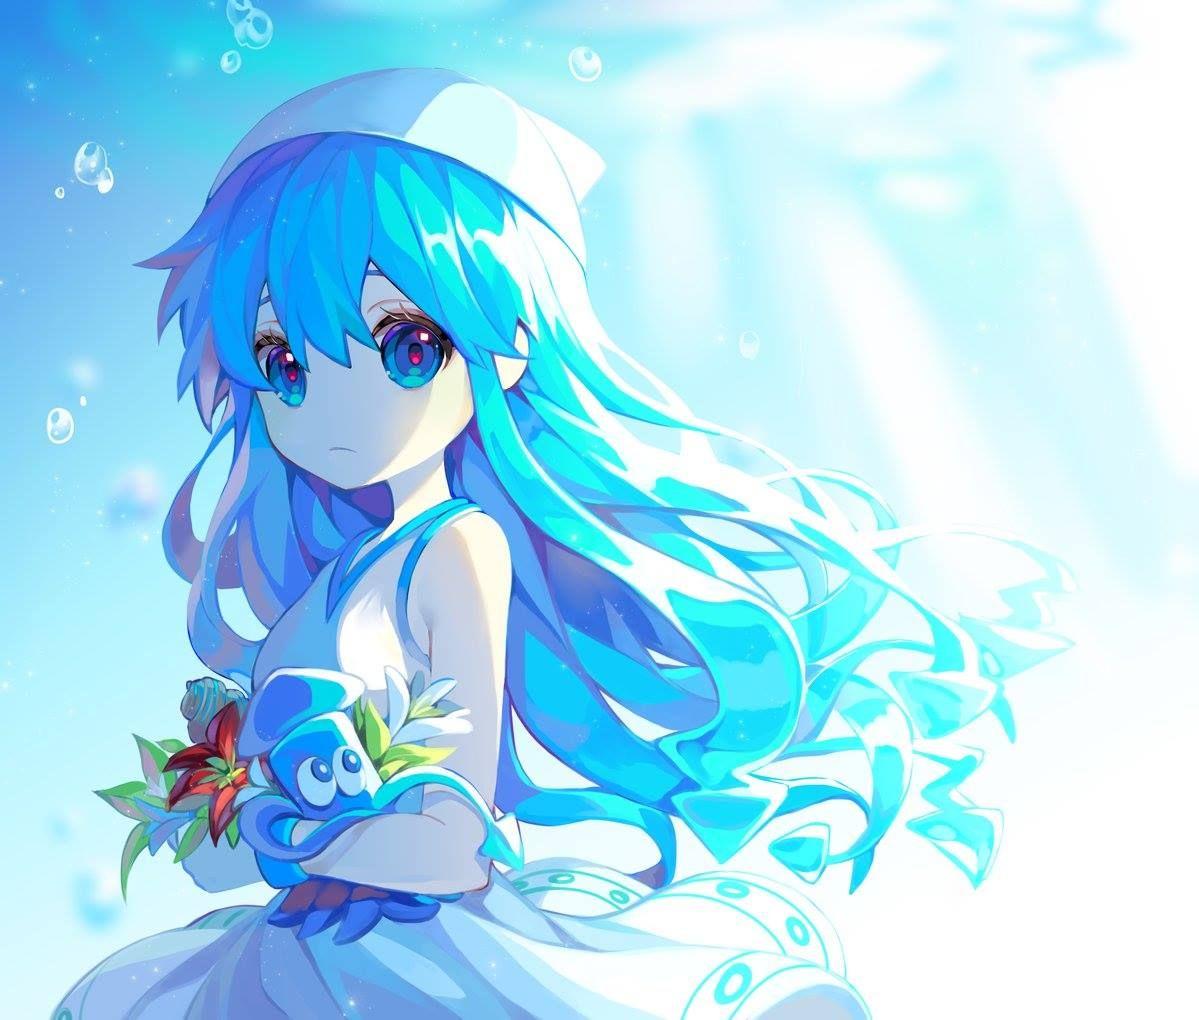 Pin on Beautiful fanart Anime ⚈ ̫